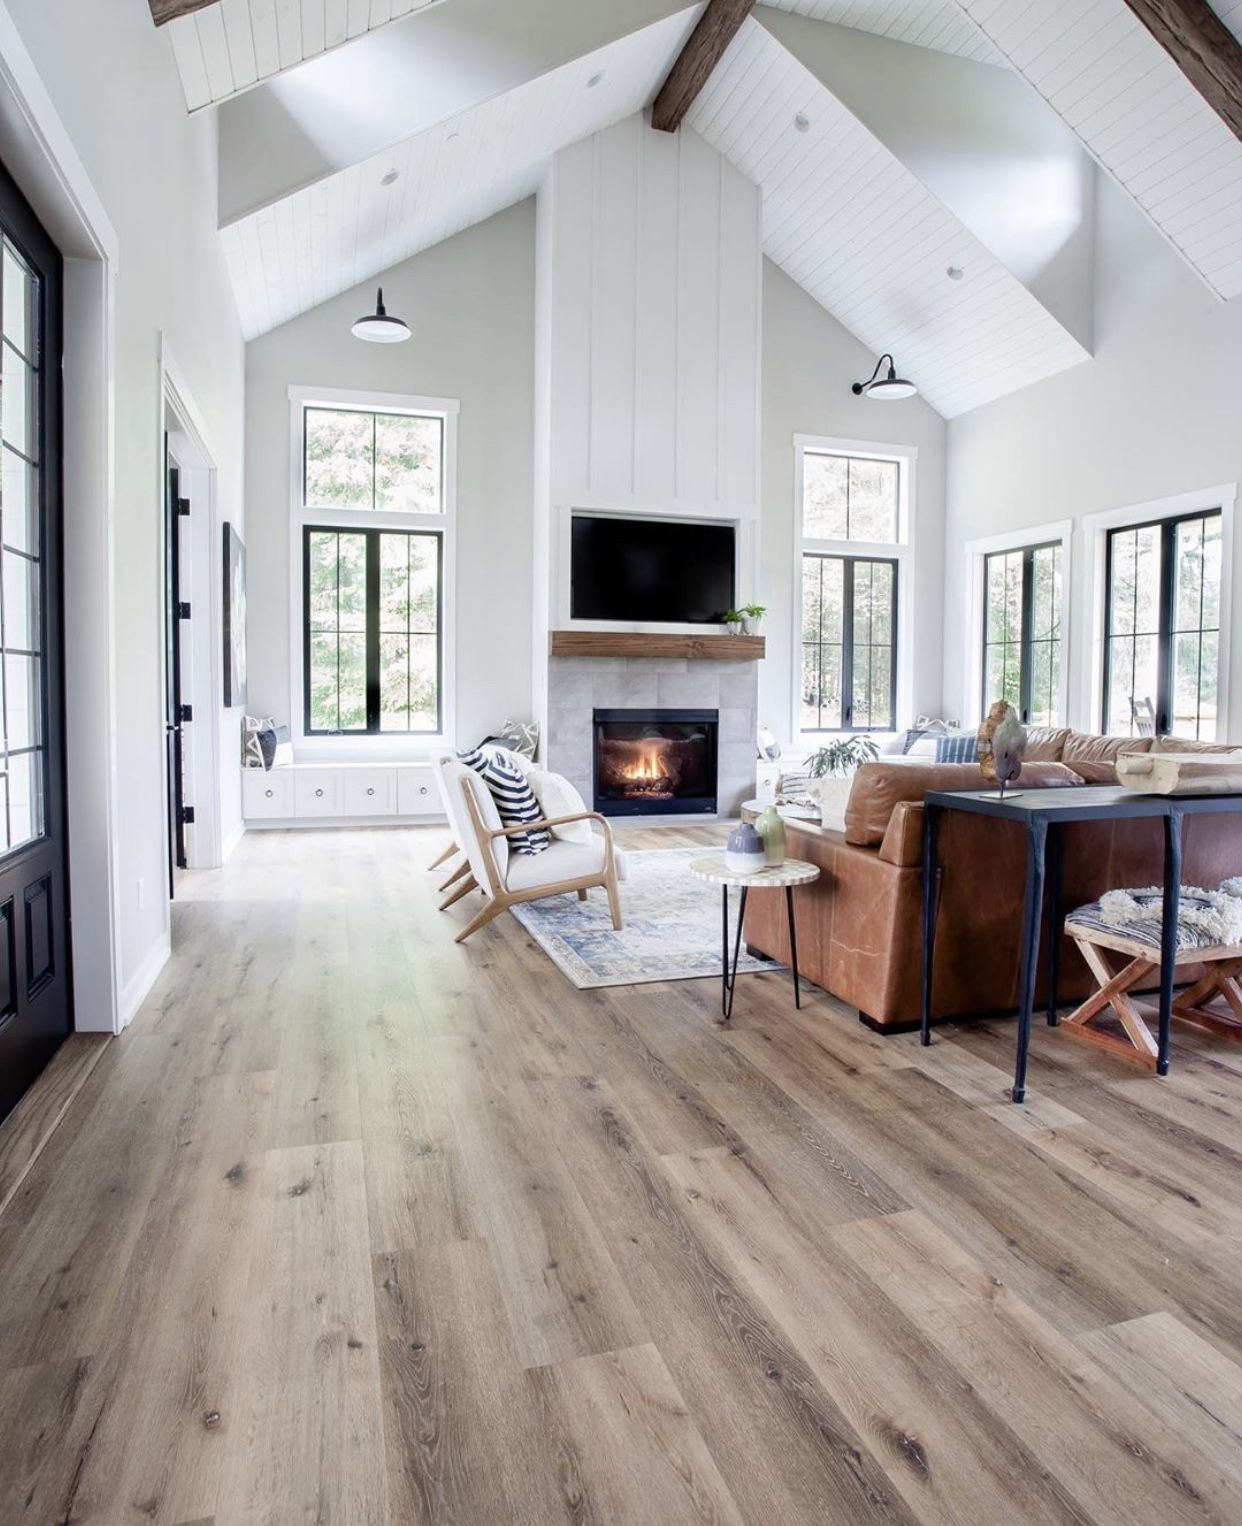 Youngscombe Luxury Vinyl Flooring Modern Farmhouse Floors Luxury Vinyl Flooring Luxury Vinyl Plank Flooring